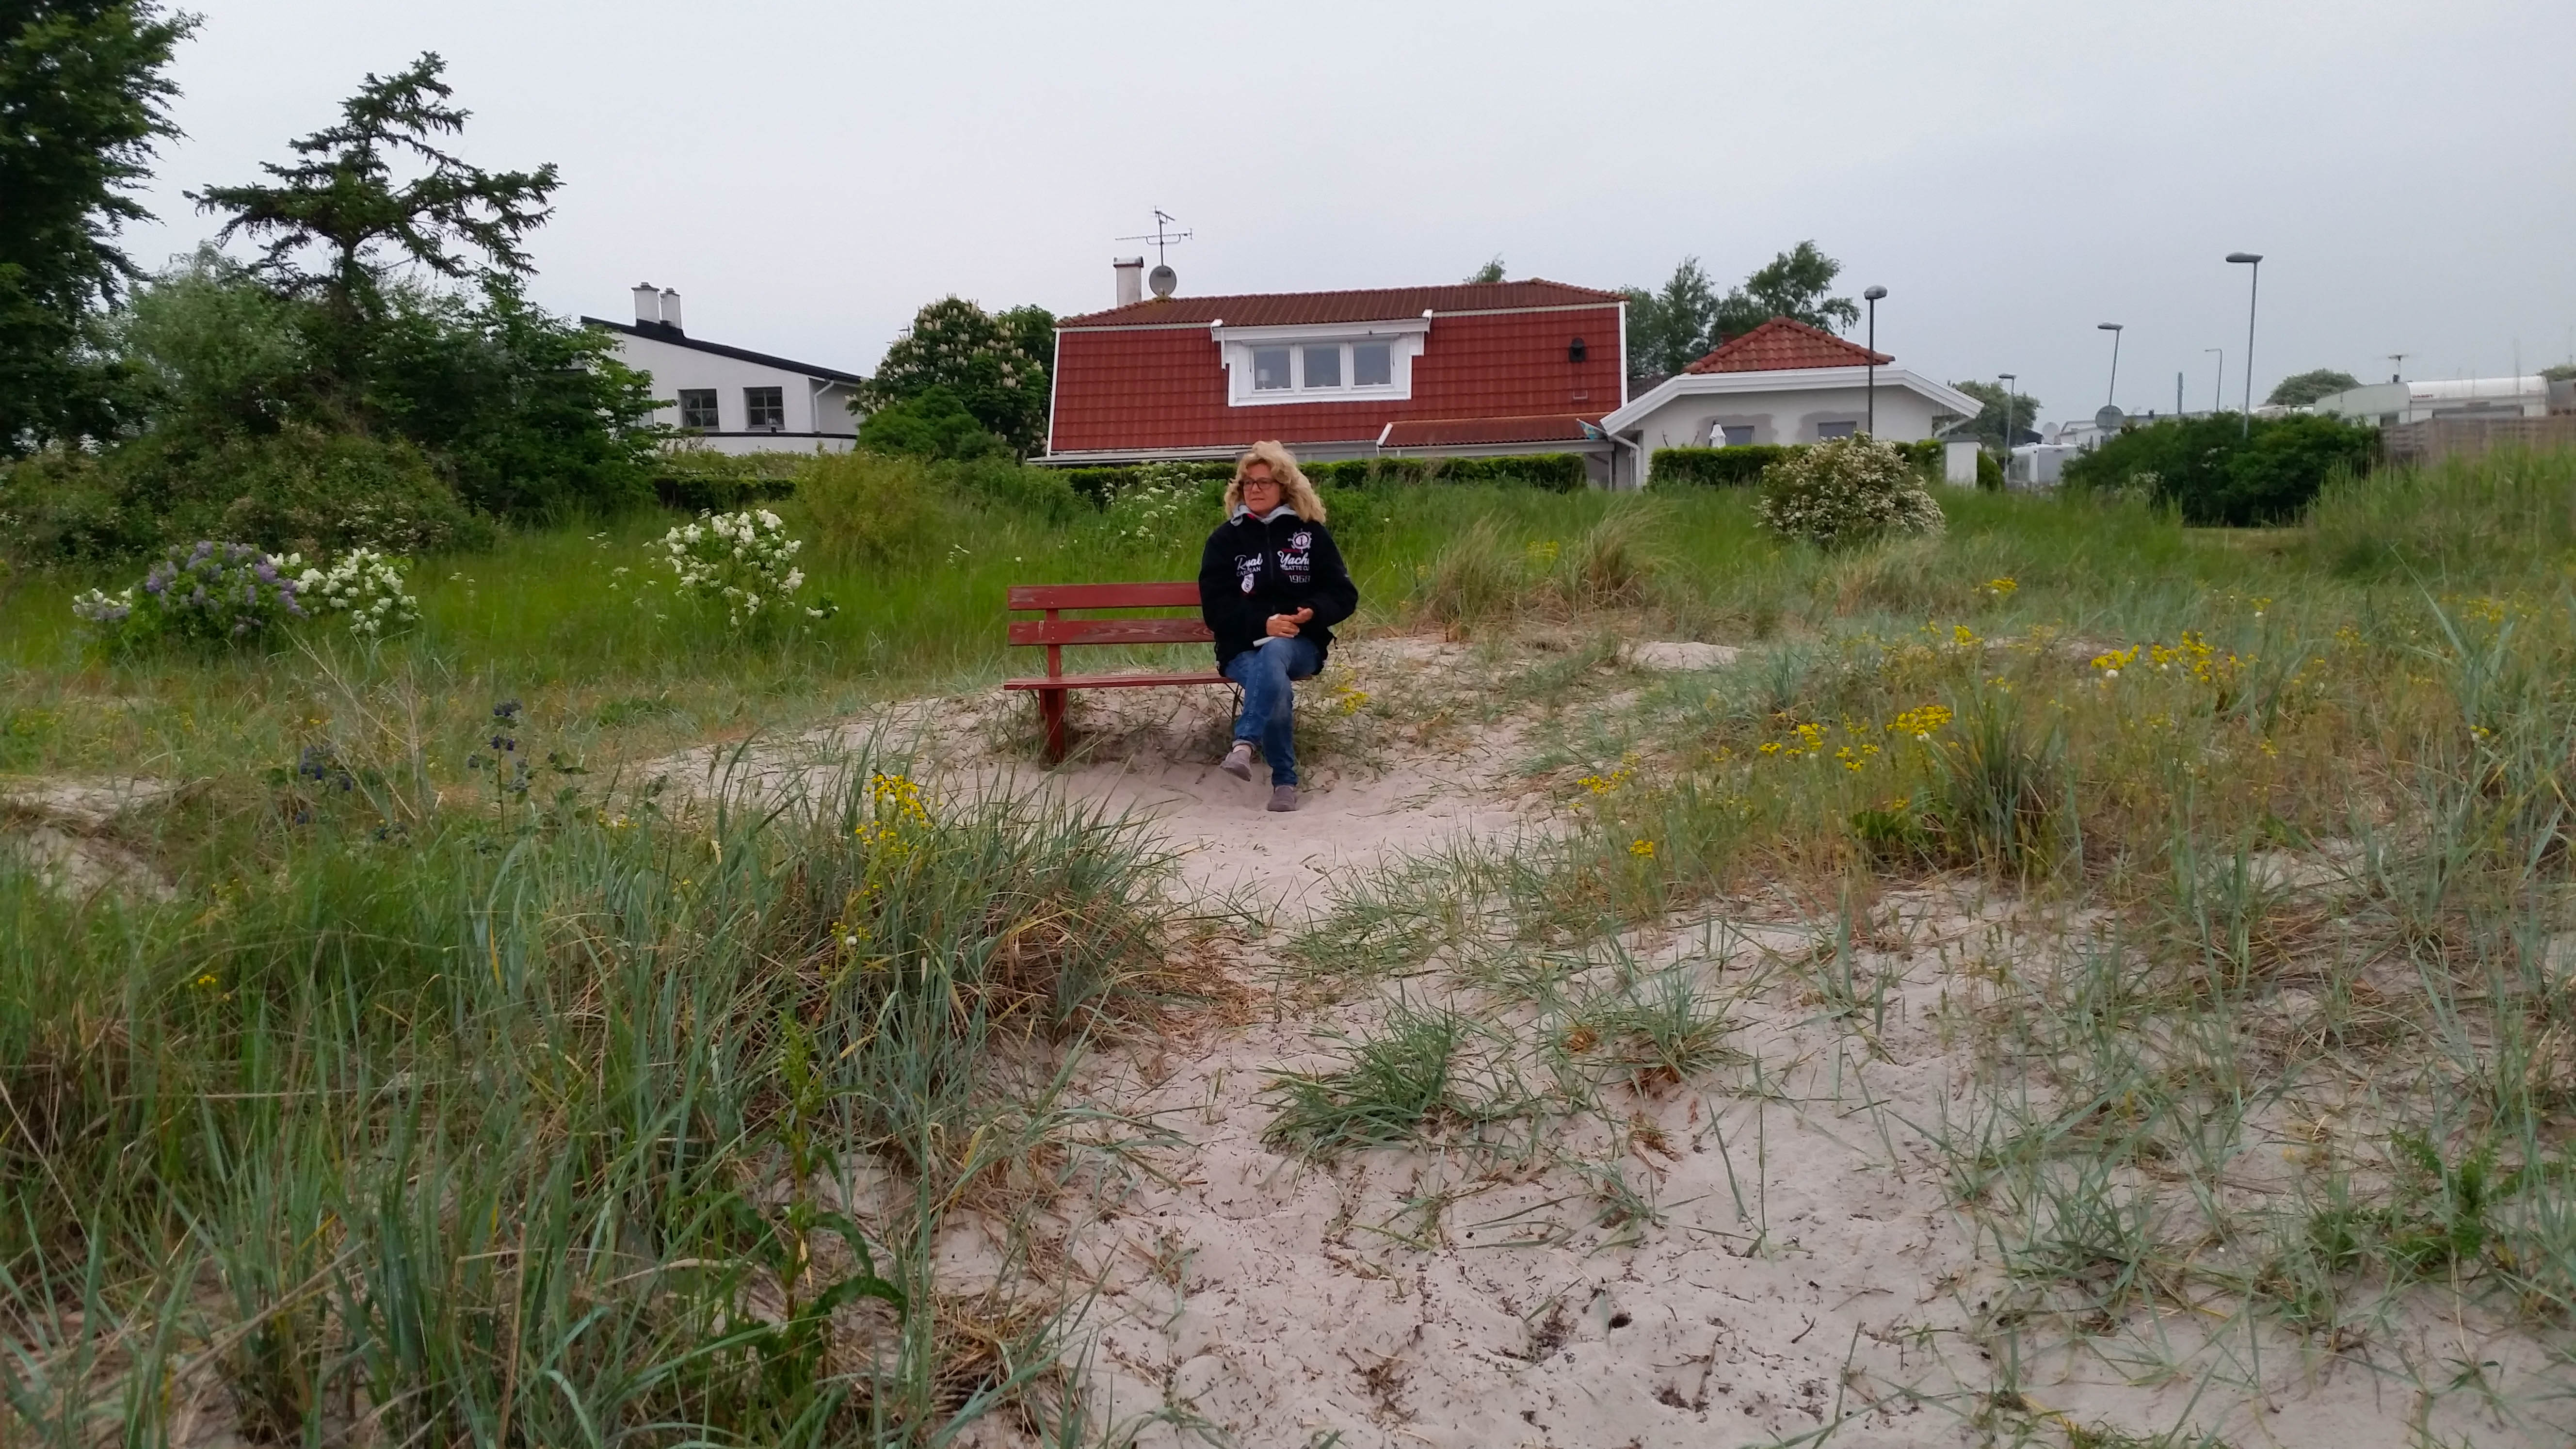 Dalköpinge Strandväg, Trelleborg